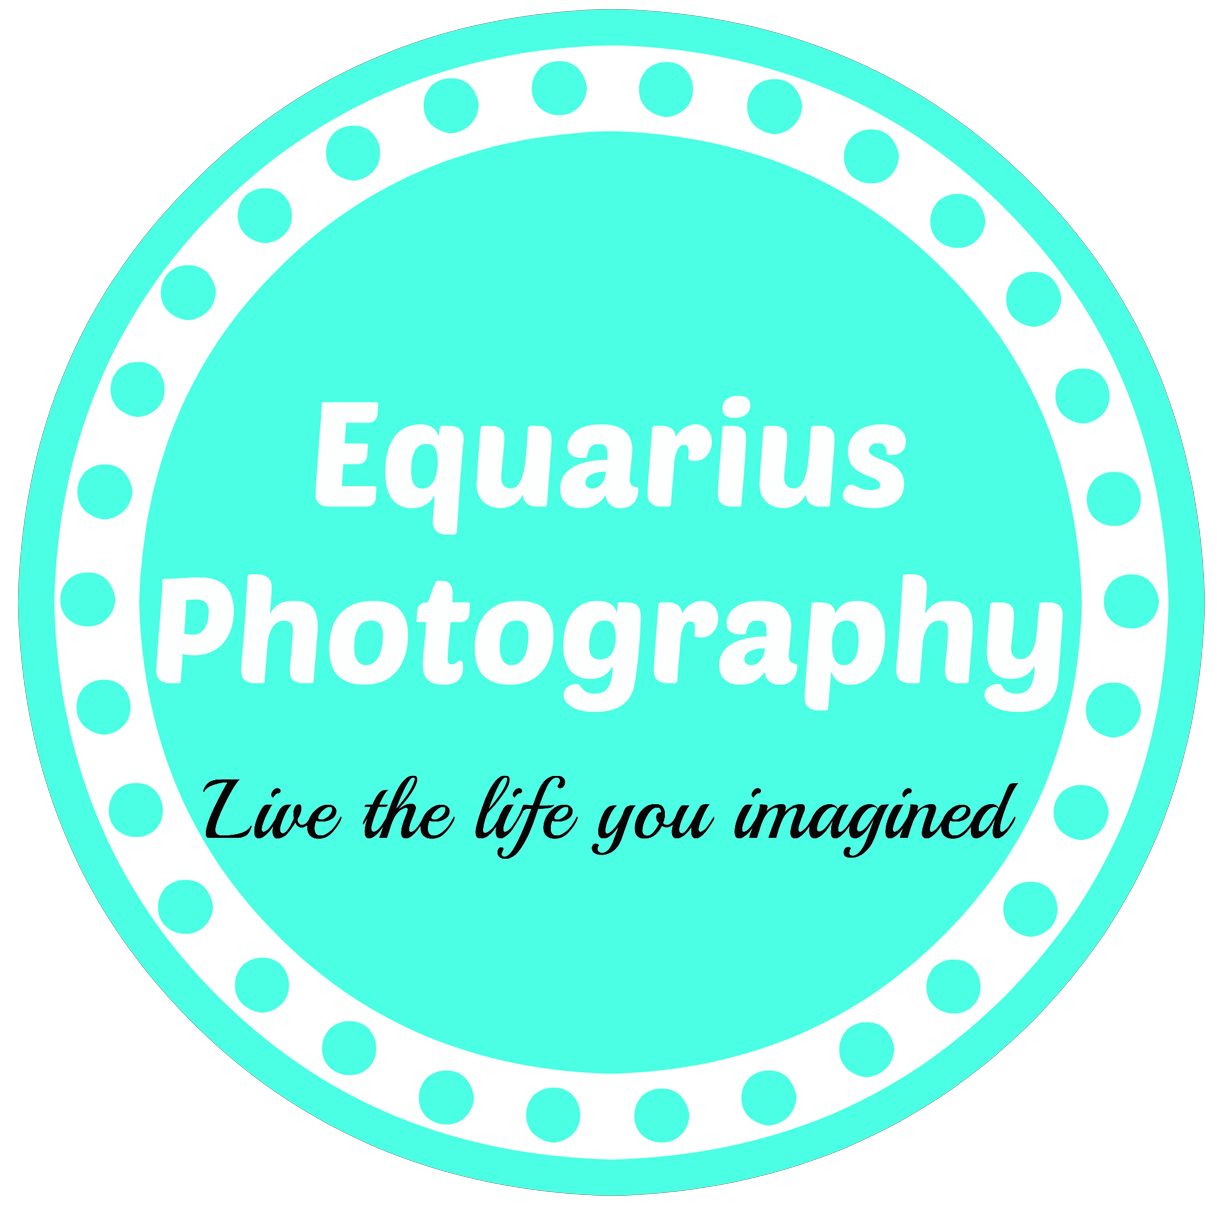 Equarius Photography